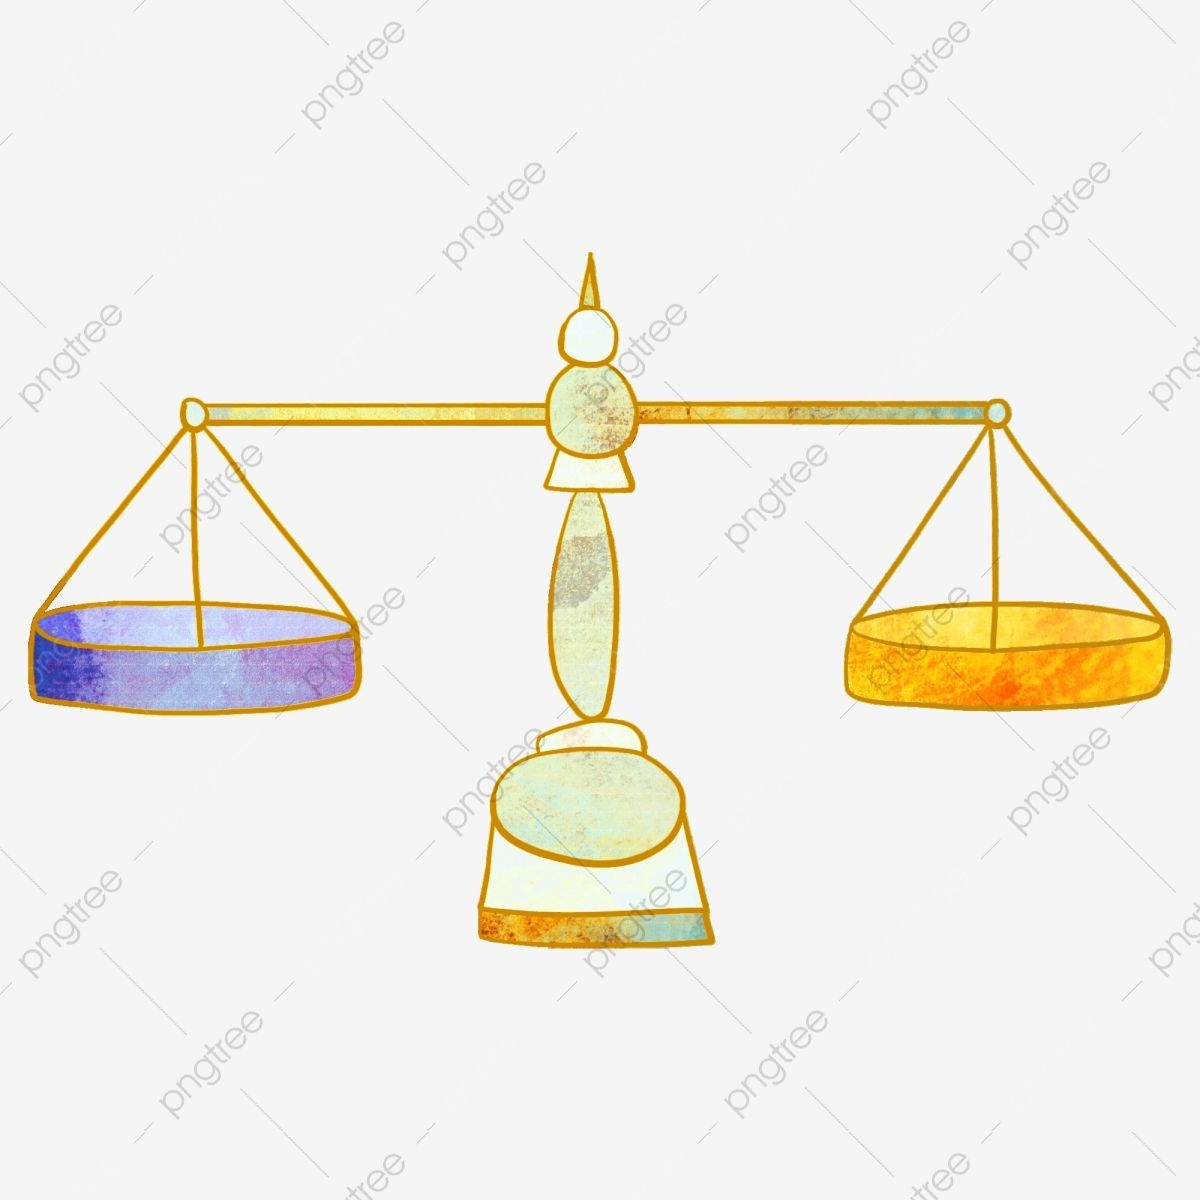 Balance Clipart Free In 2021 Free Clip Art Clip Art Balance Scale Art